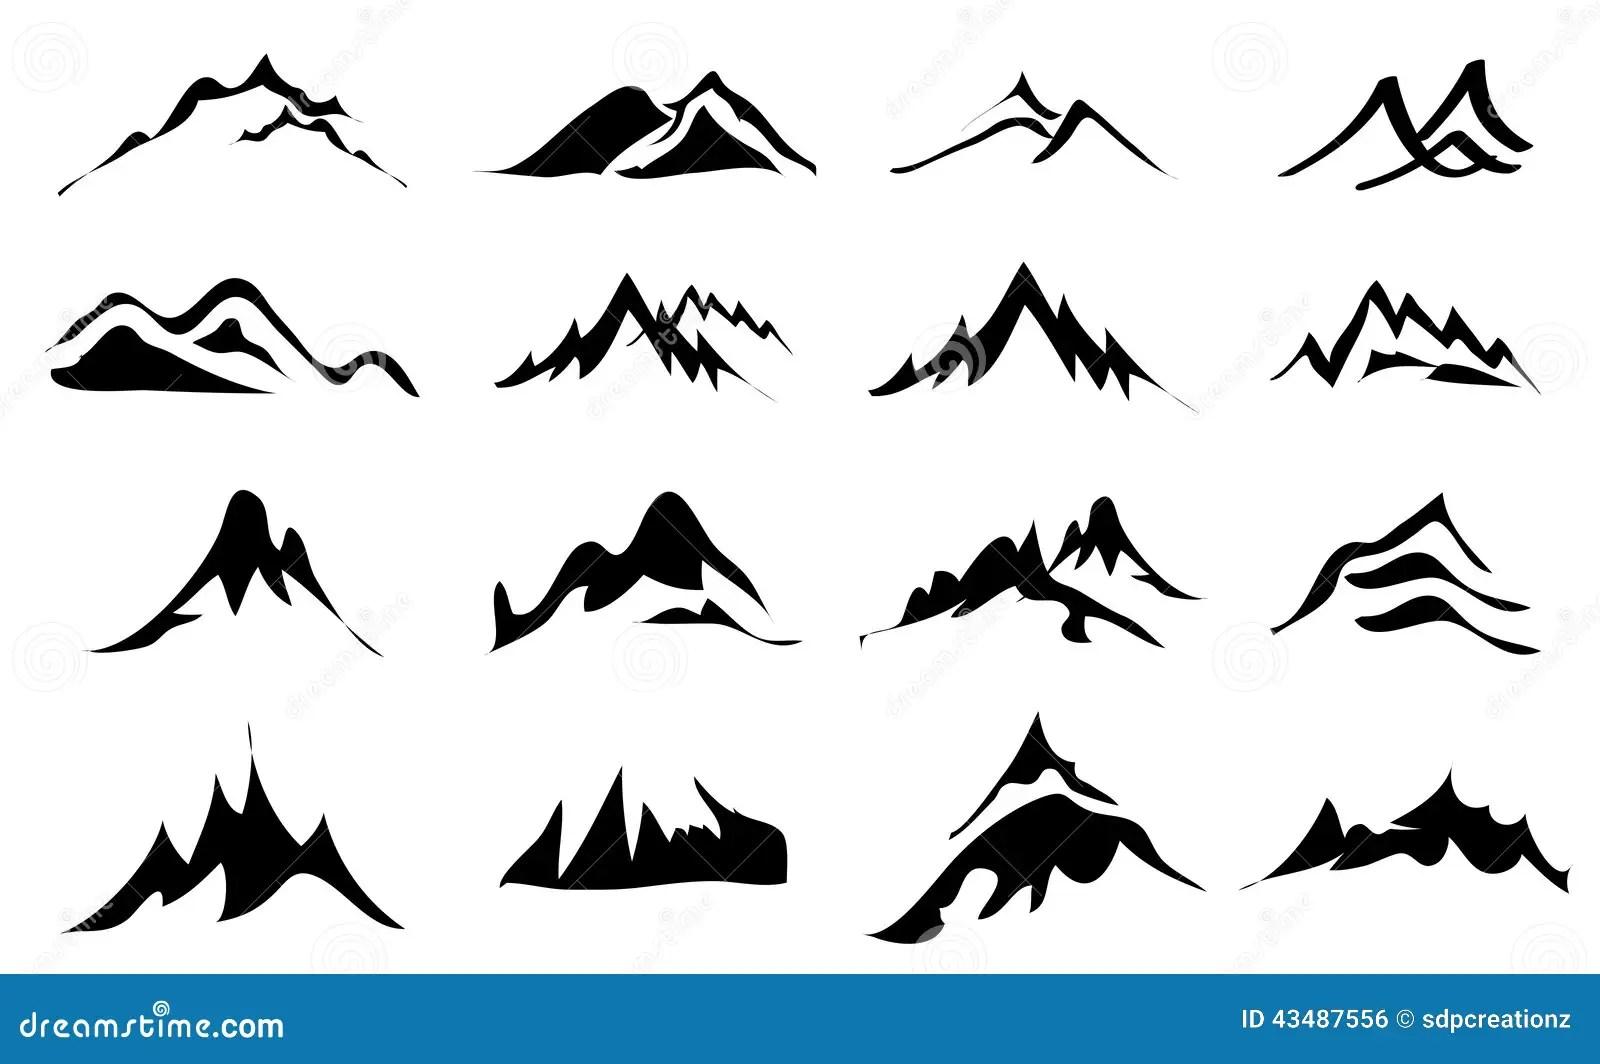 Icones De Montagnes Reglees Illustration De Vecteur